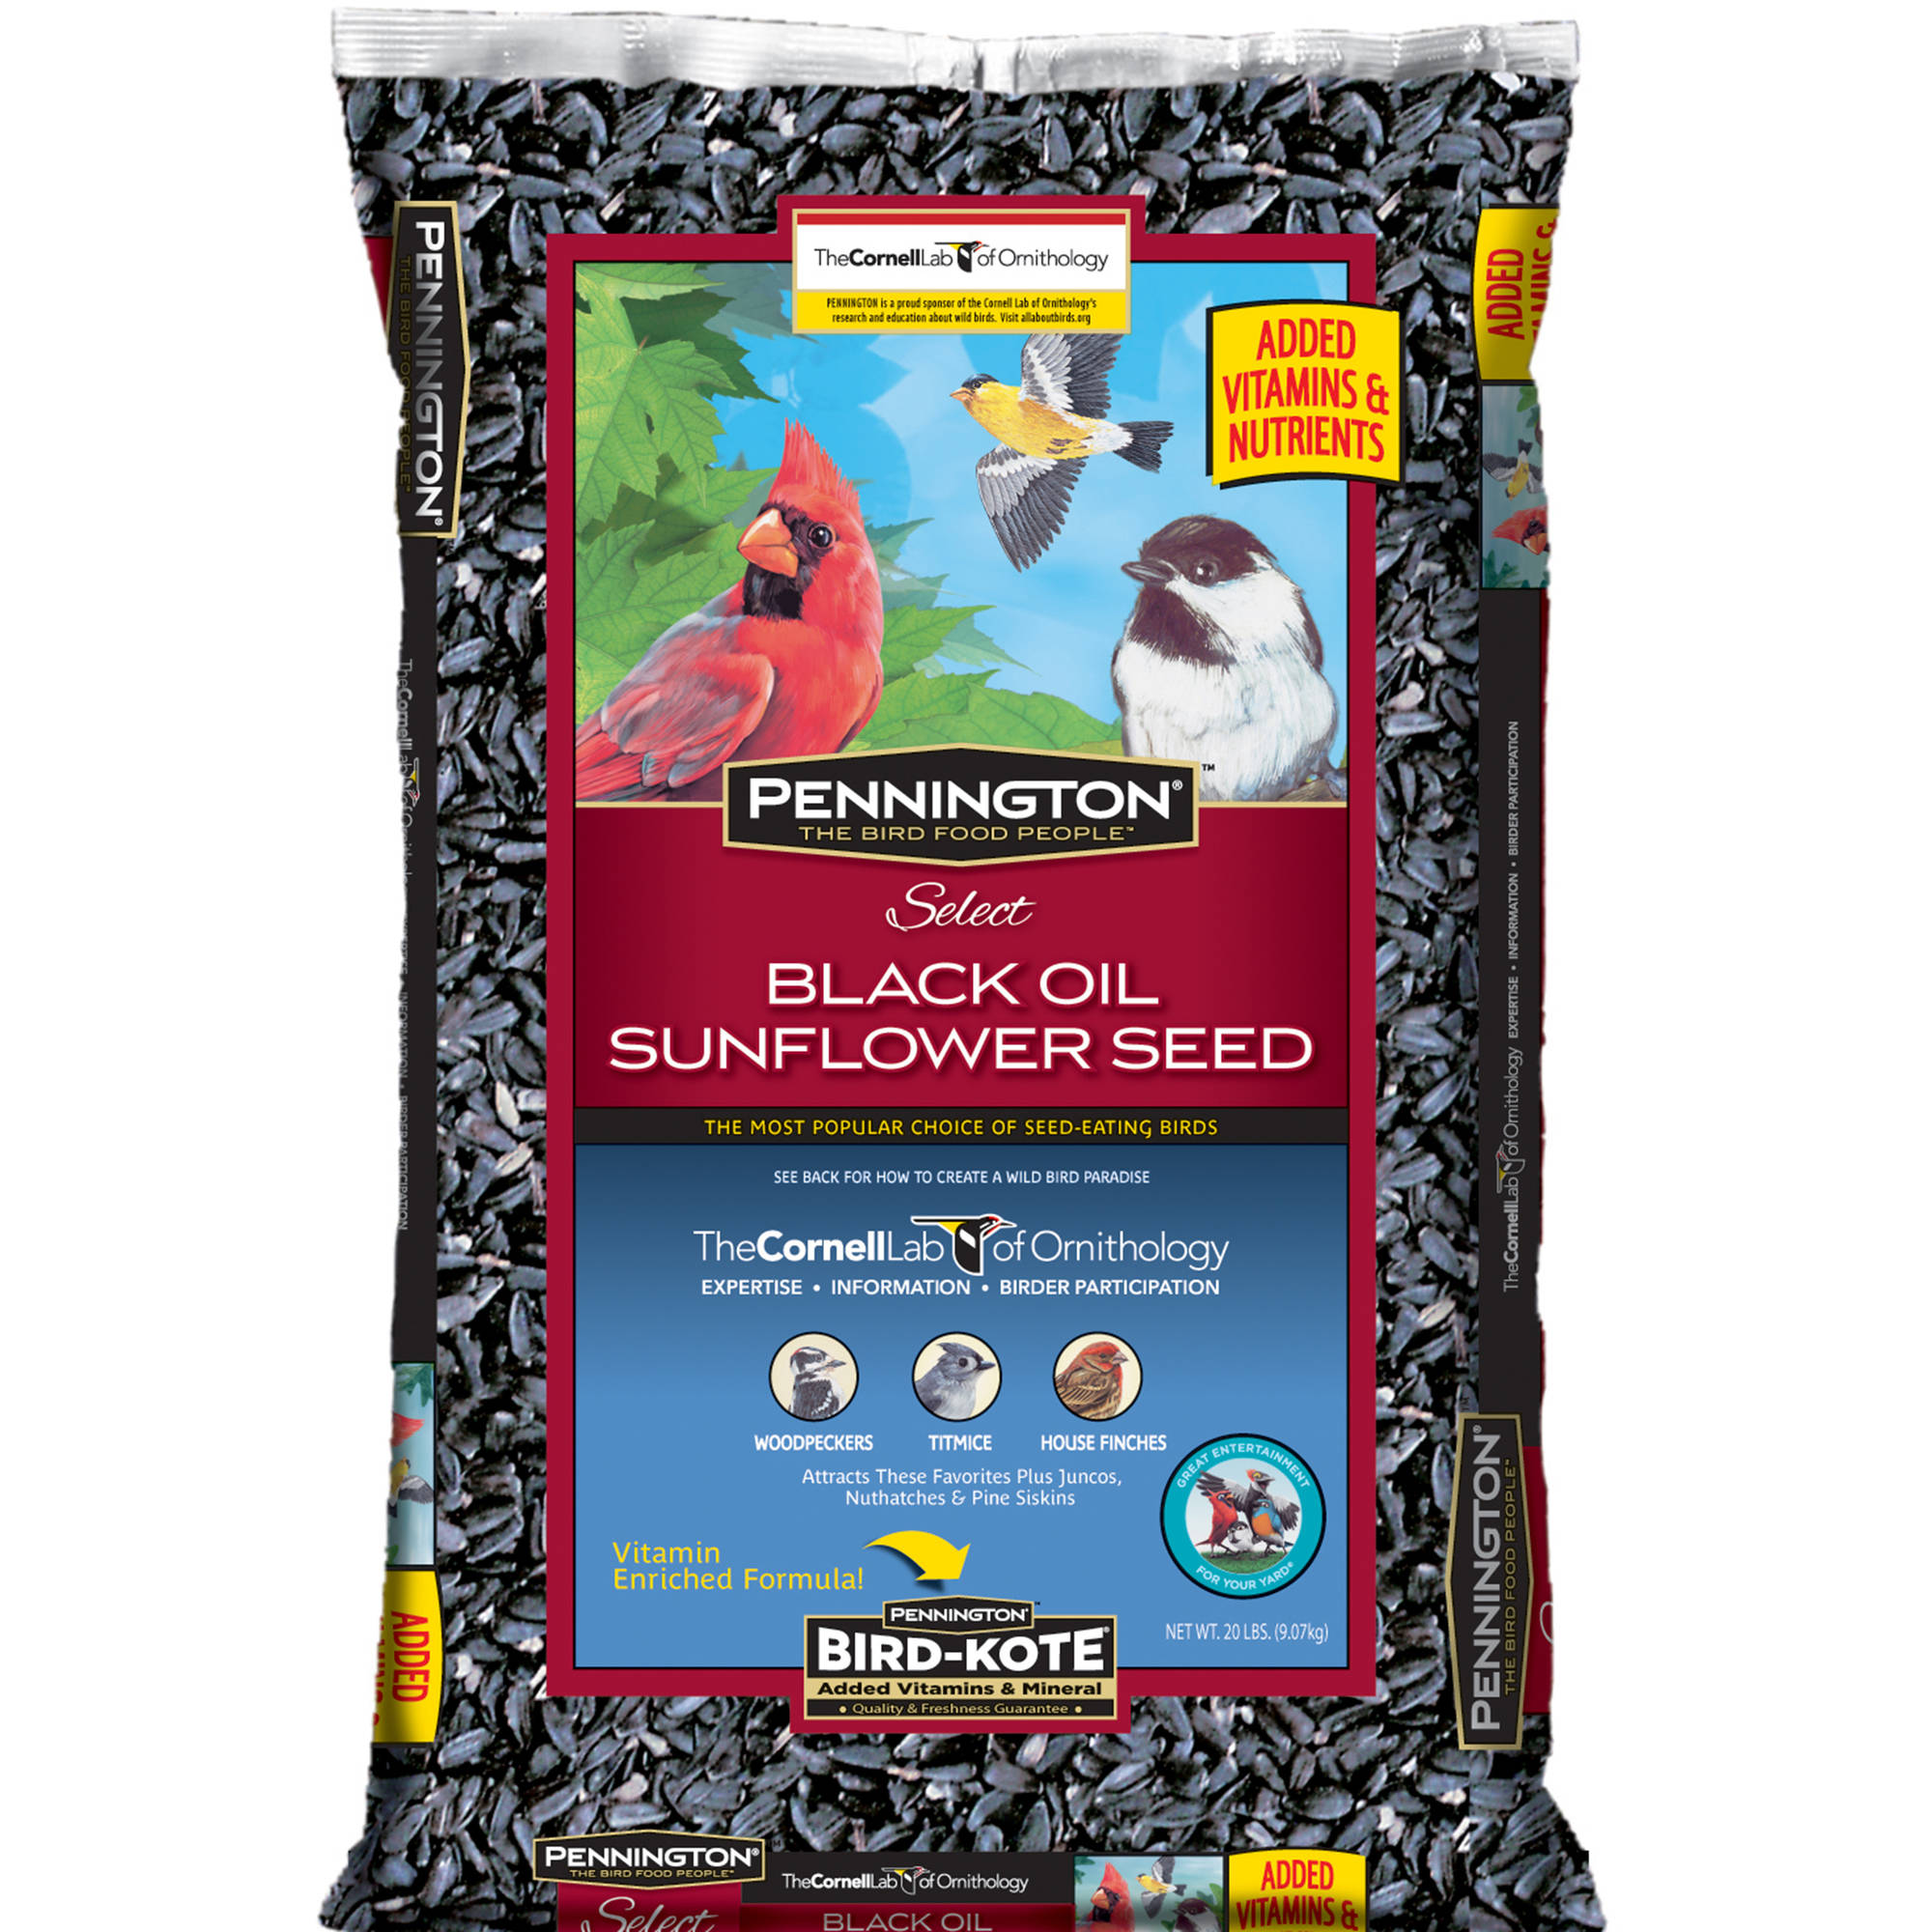 Pennington Select Black Oil Sunflower Seed Wild Bird Feed, 20 lbs